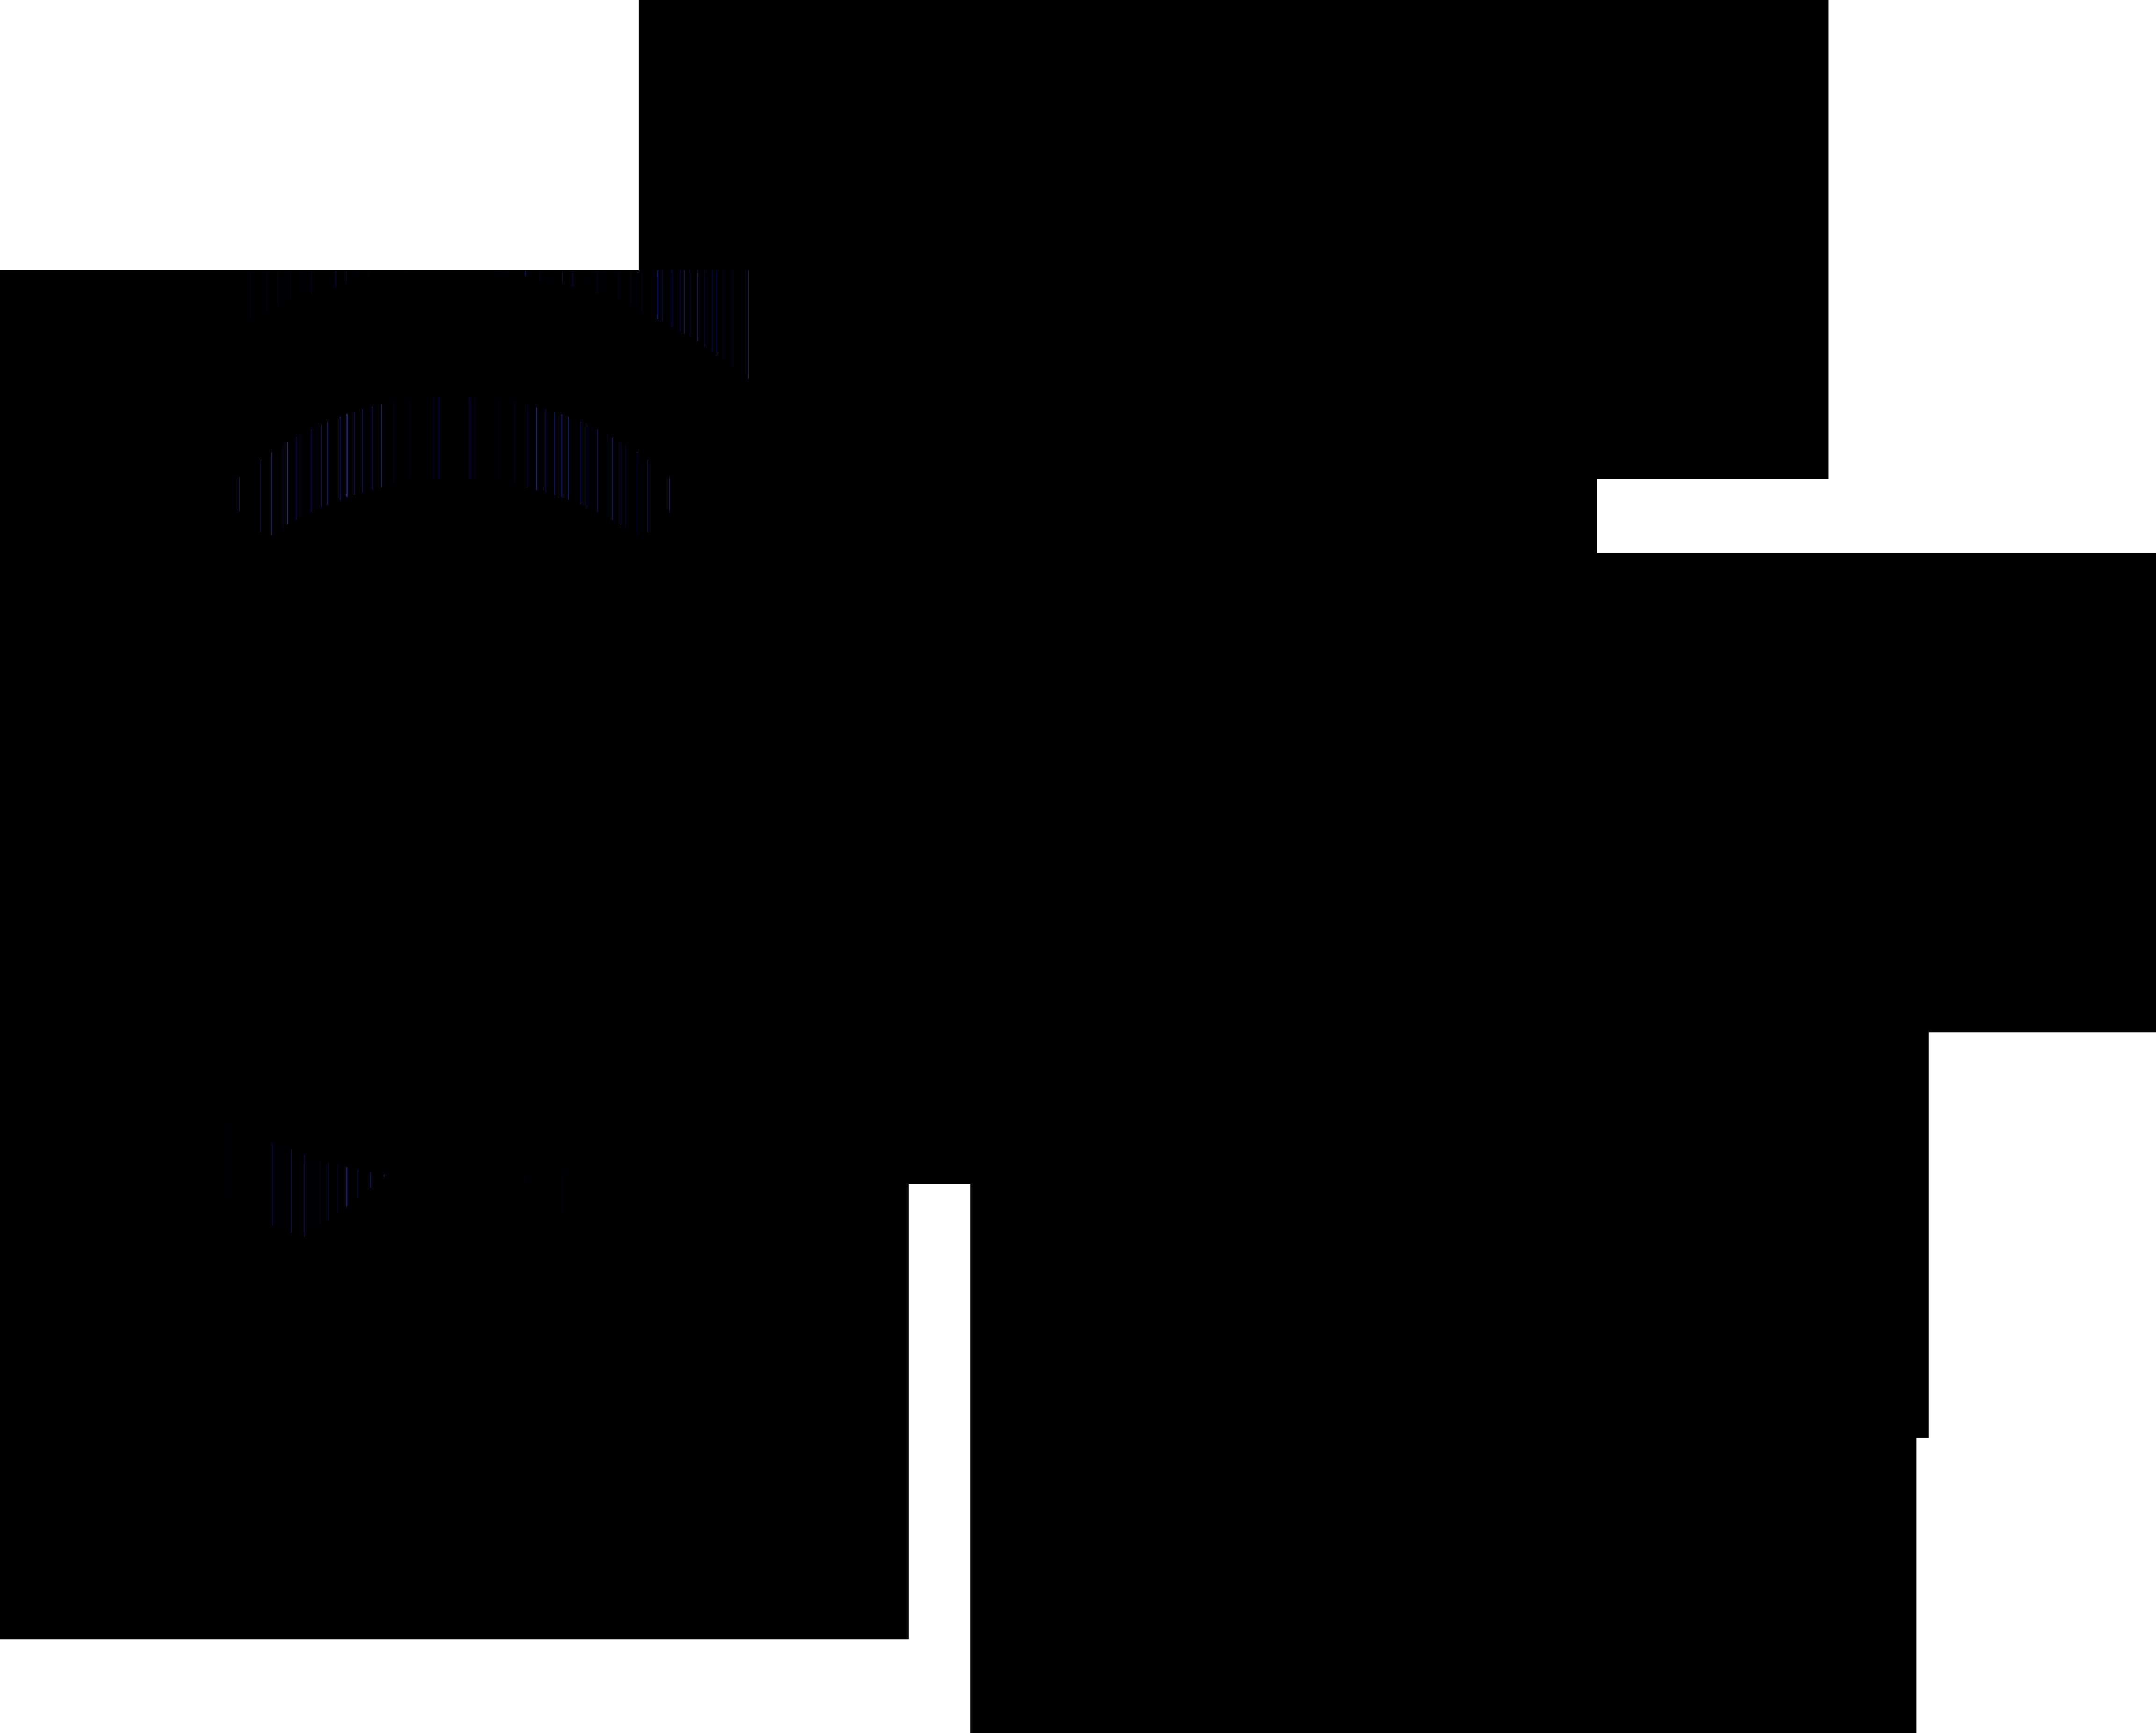 Nonbinary man symbol interlocked with a Venus symbol and a Mars symbol.